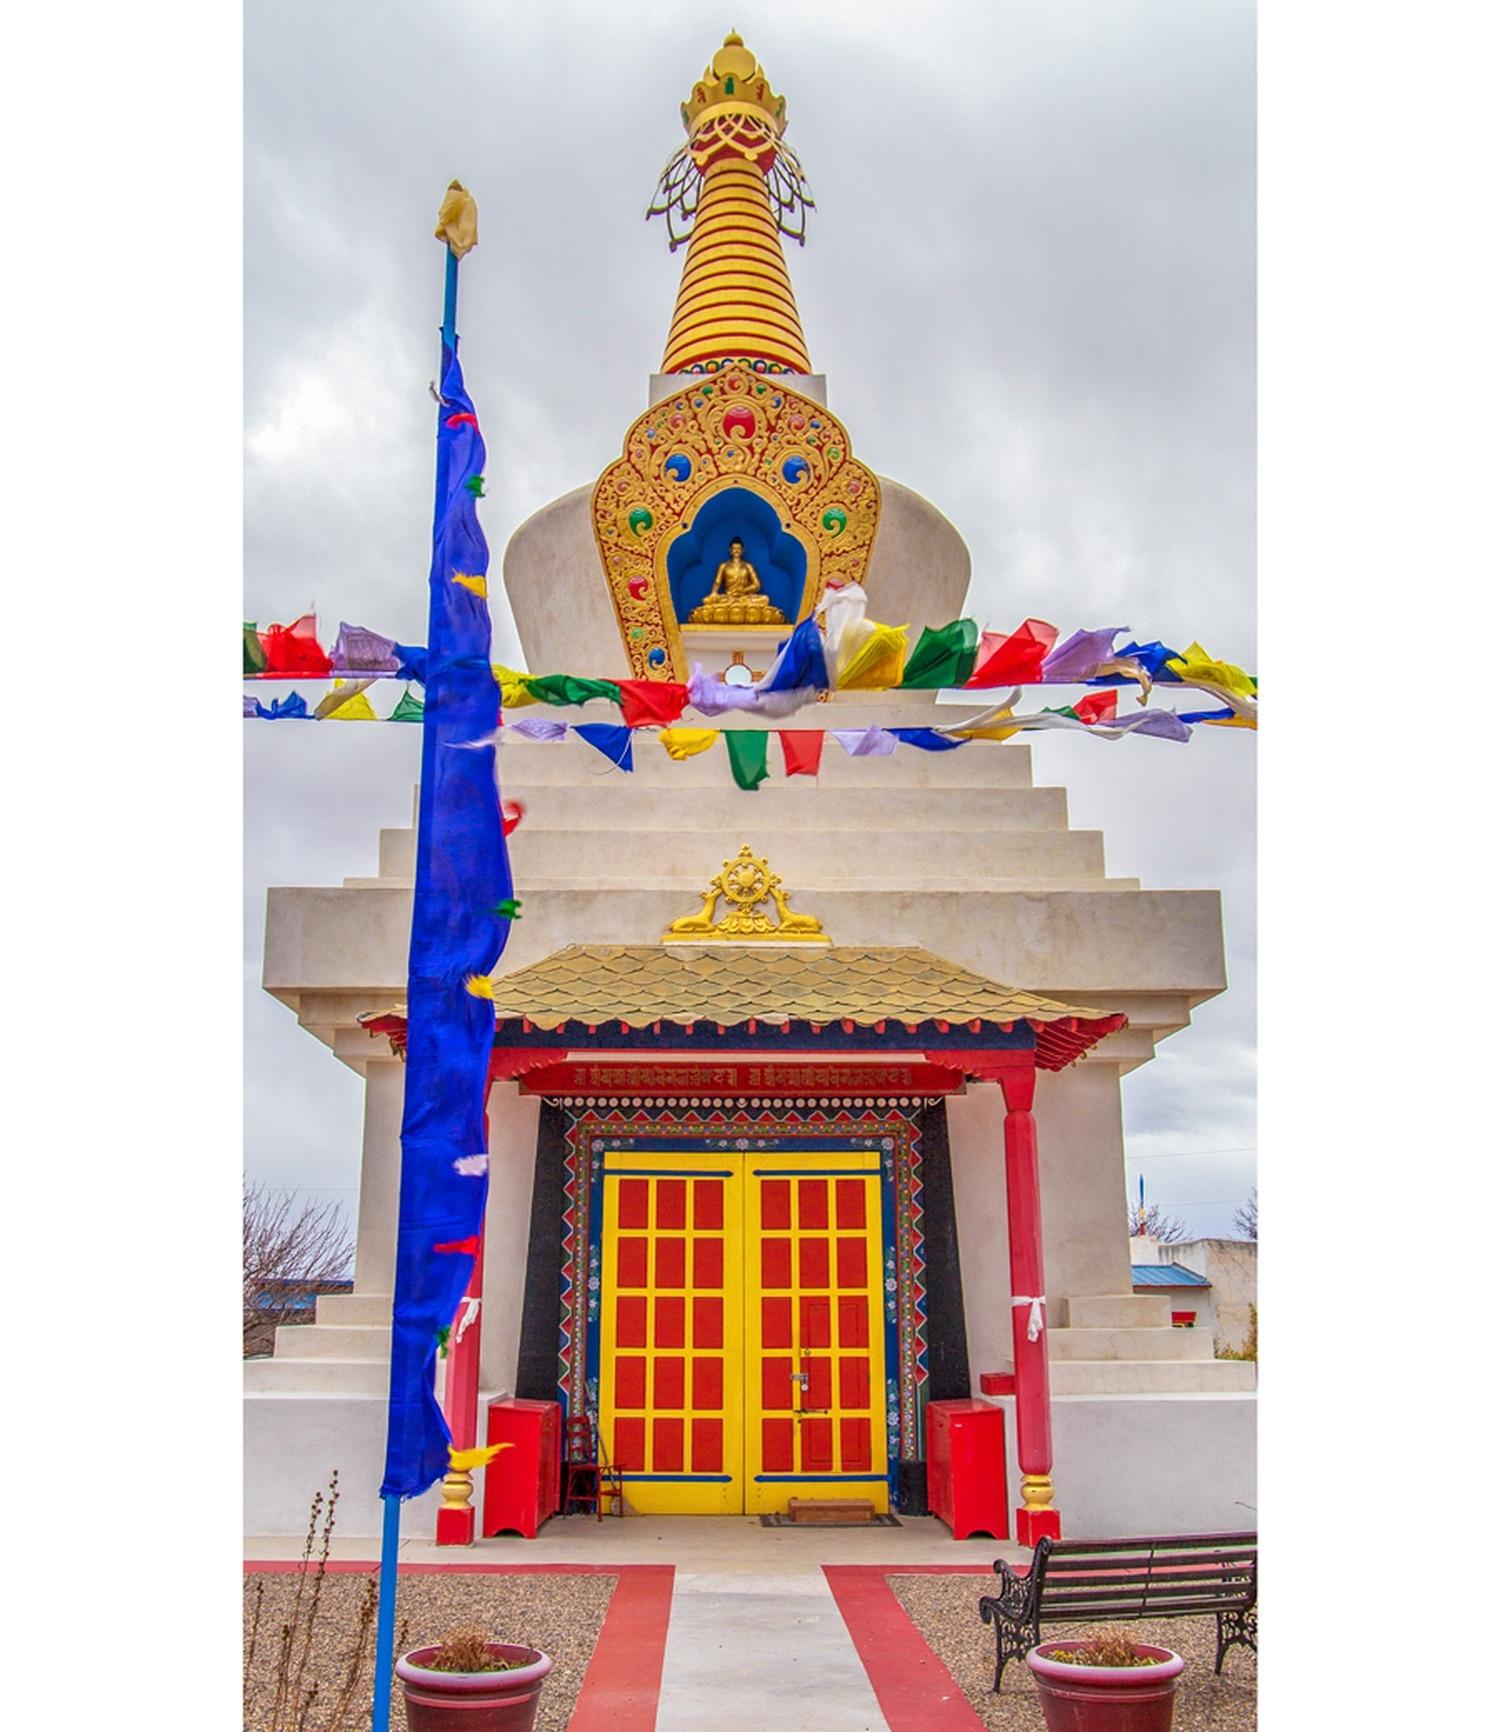 The stupa at the Kagyu Shenpen Kunchab Tibetan Buddhist Center symbolizes love, compassion and liberation, its lama tells SFR.